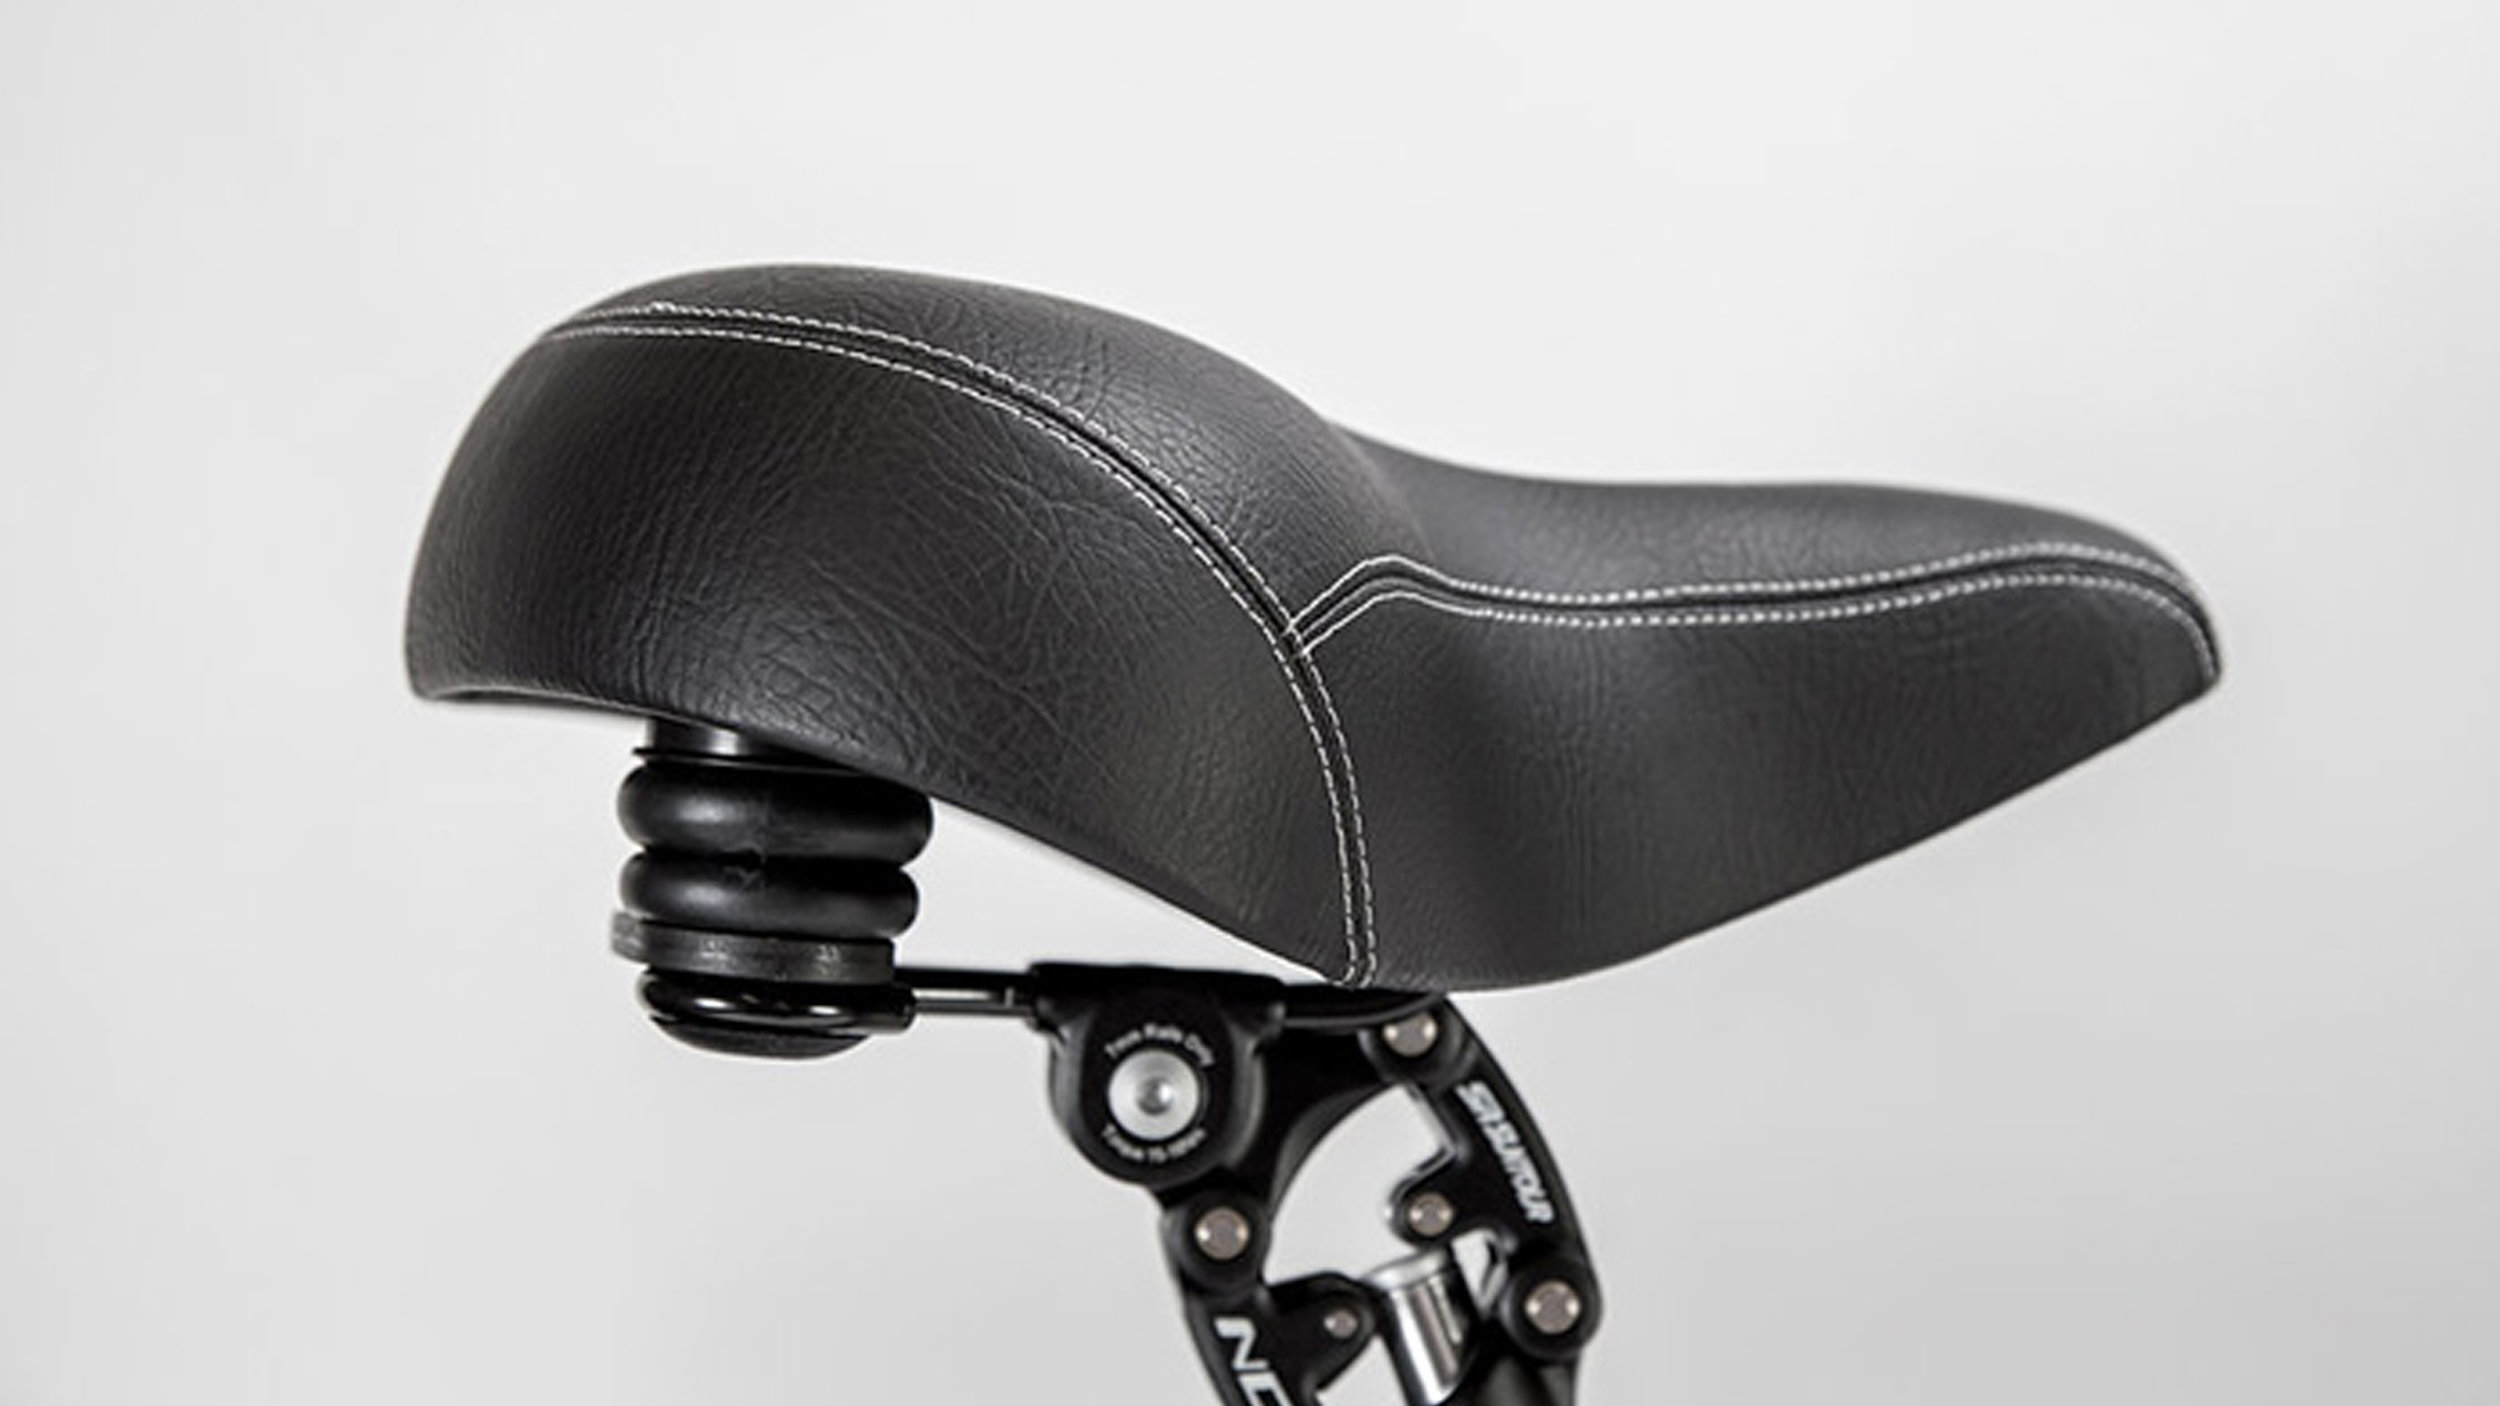 electrified-reviews-electric-bike-company-model-c-electric-bike-review-saddle-springs.jpg